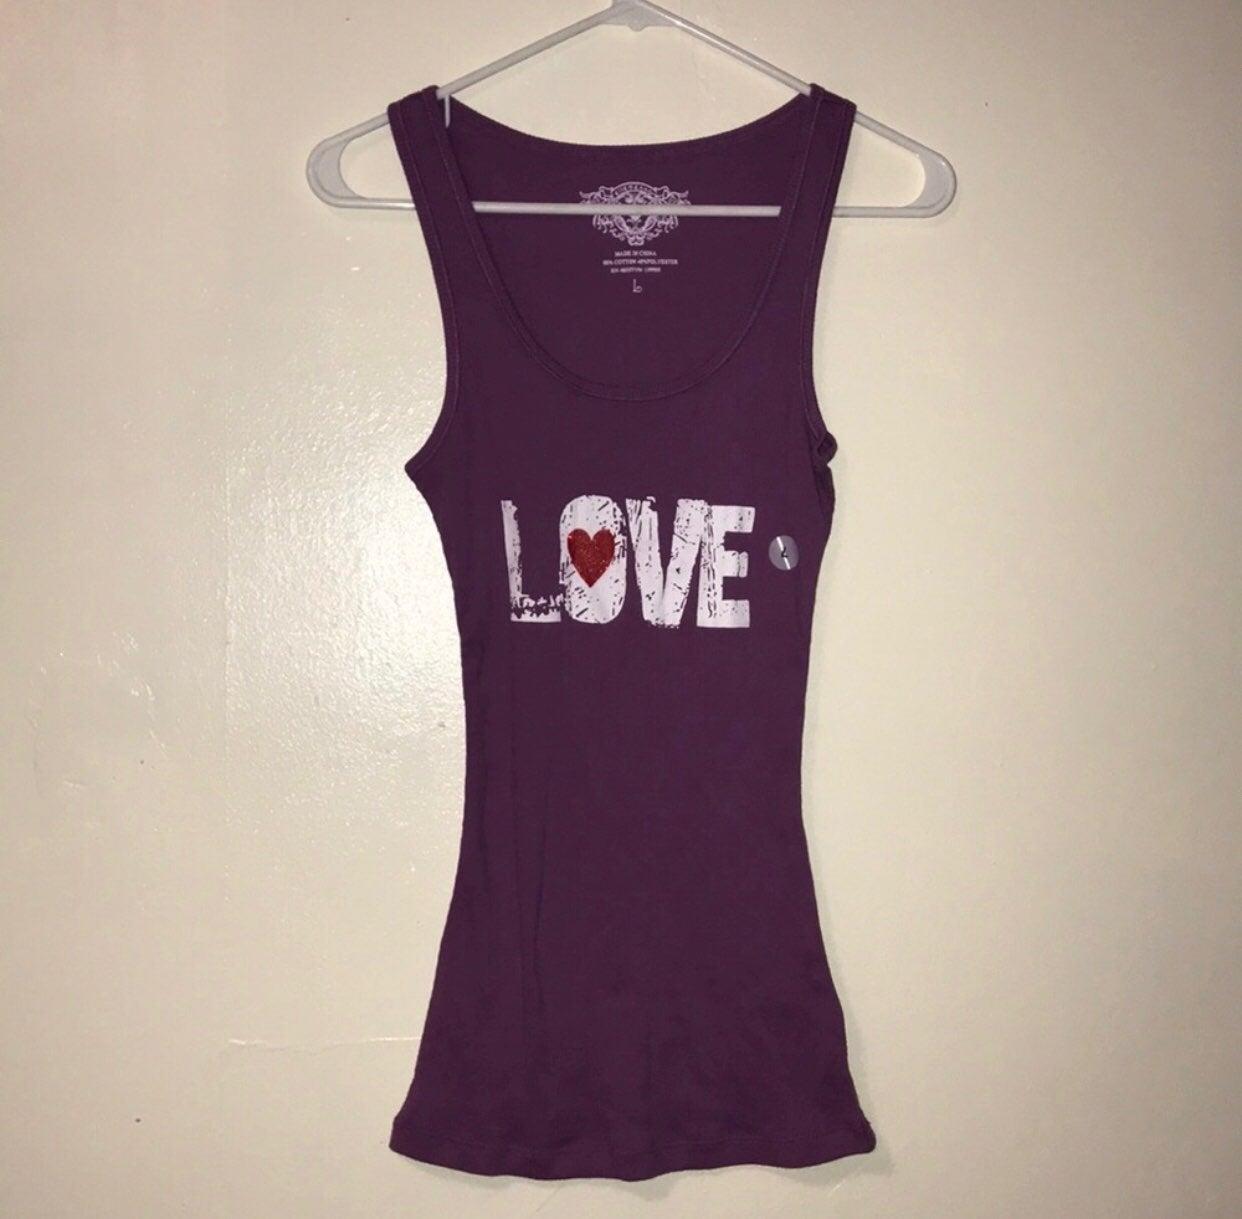 NWT! Purple 'LOVE' ribbed tank top